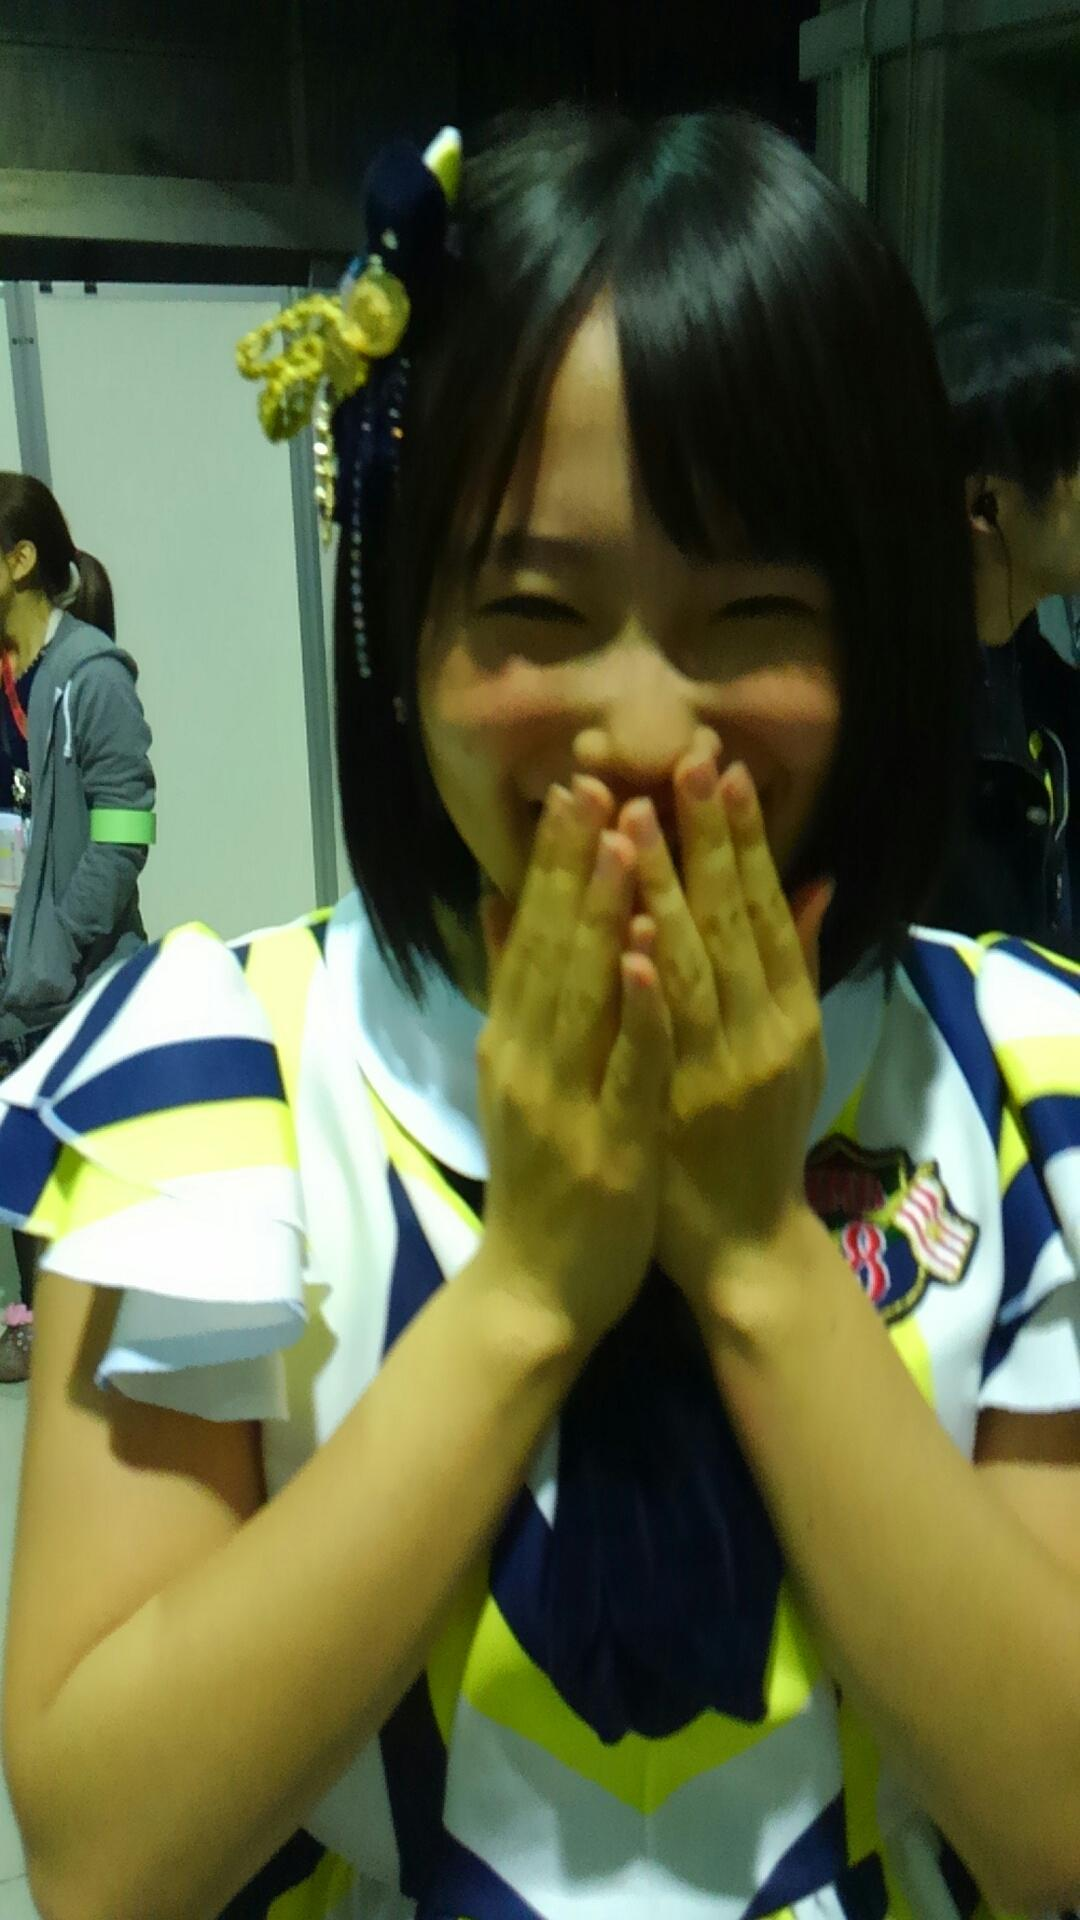 NMB48テンプレおよびエロ画像置き場 [無断転載禁止]©2ch.netYouTube動画>8本 ->画像>750枚